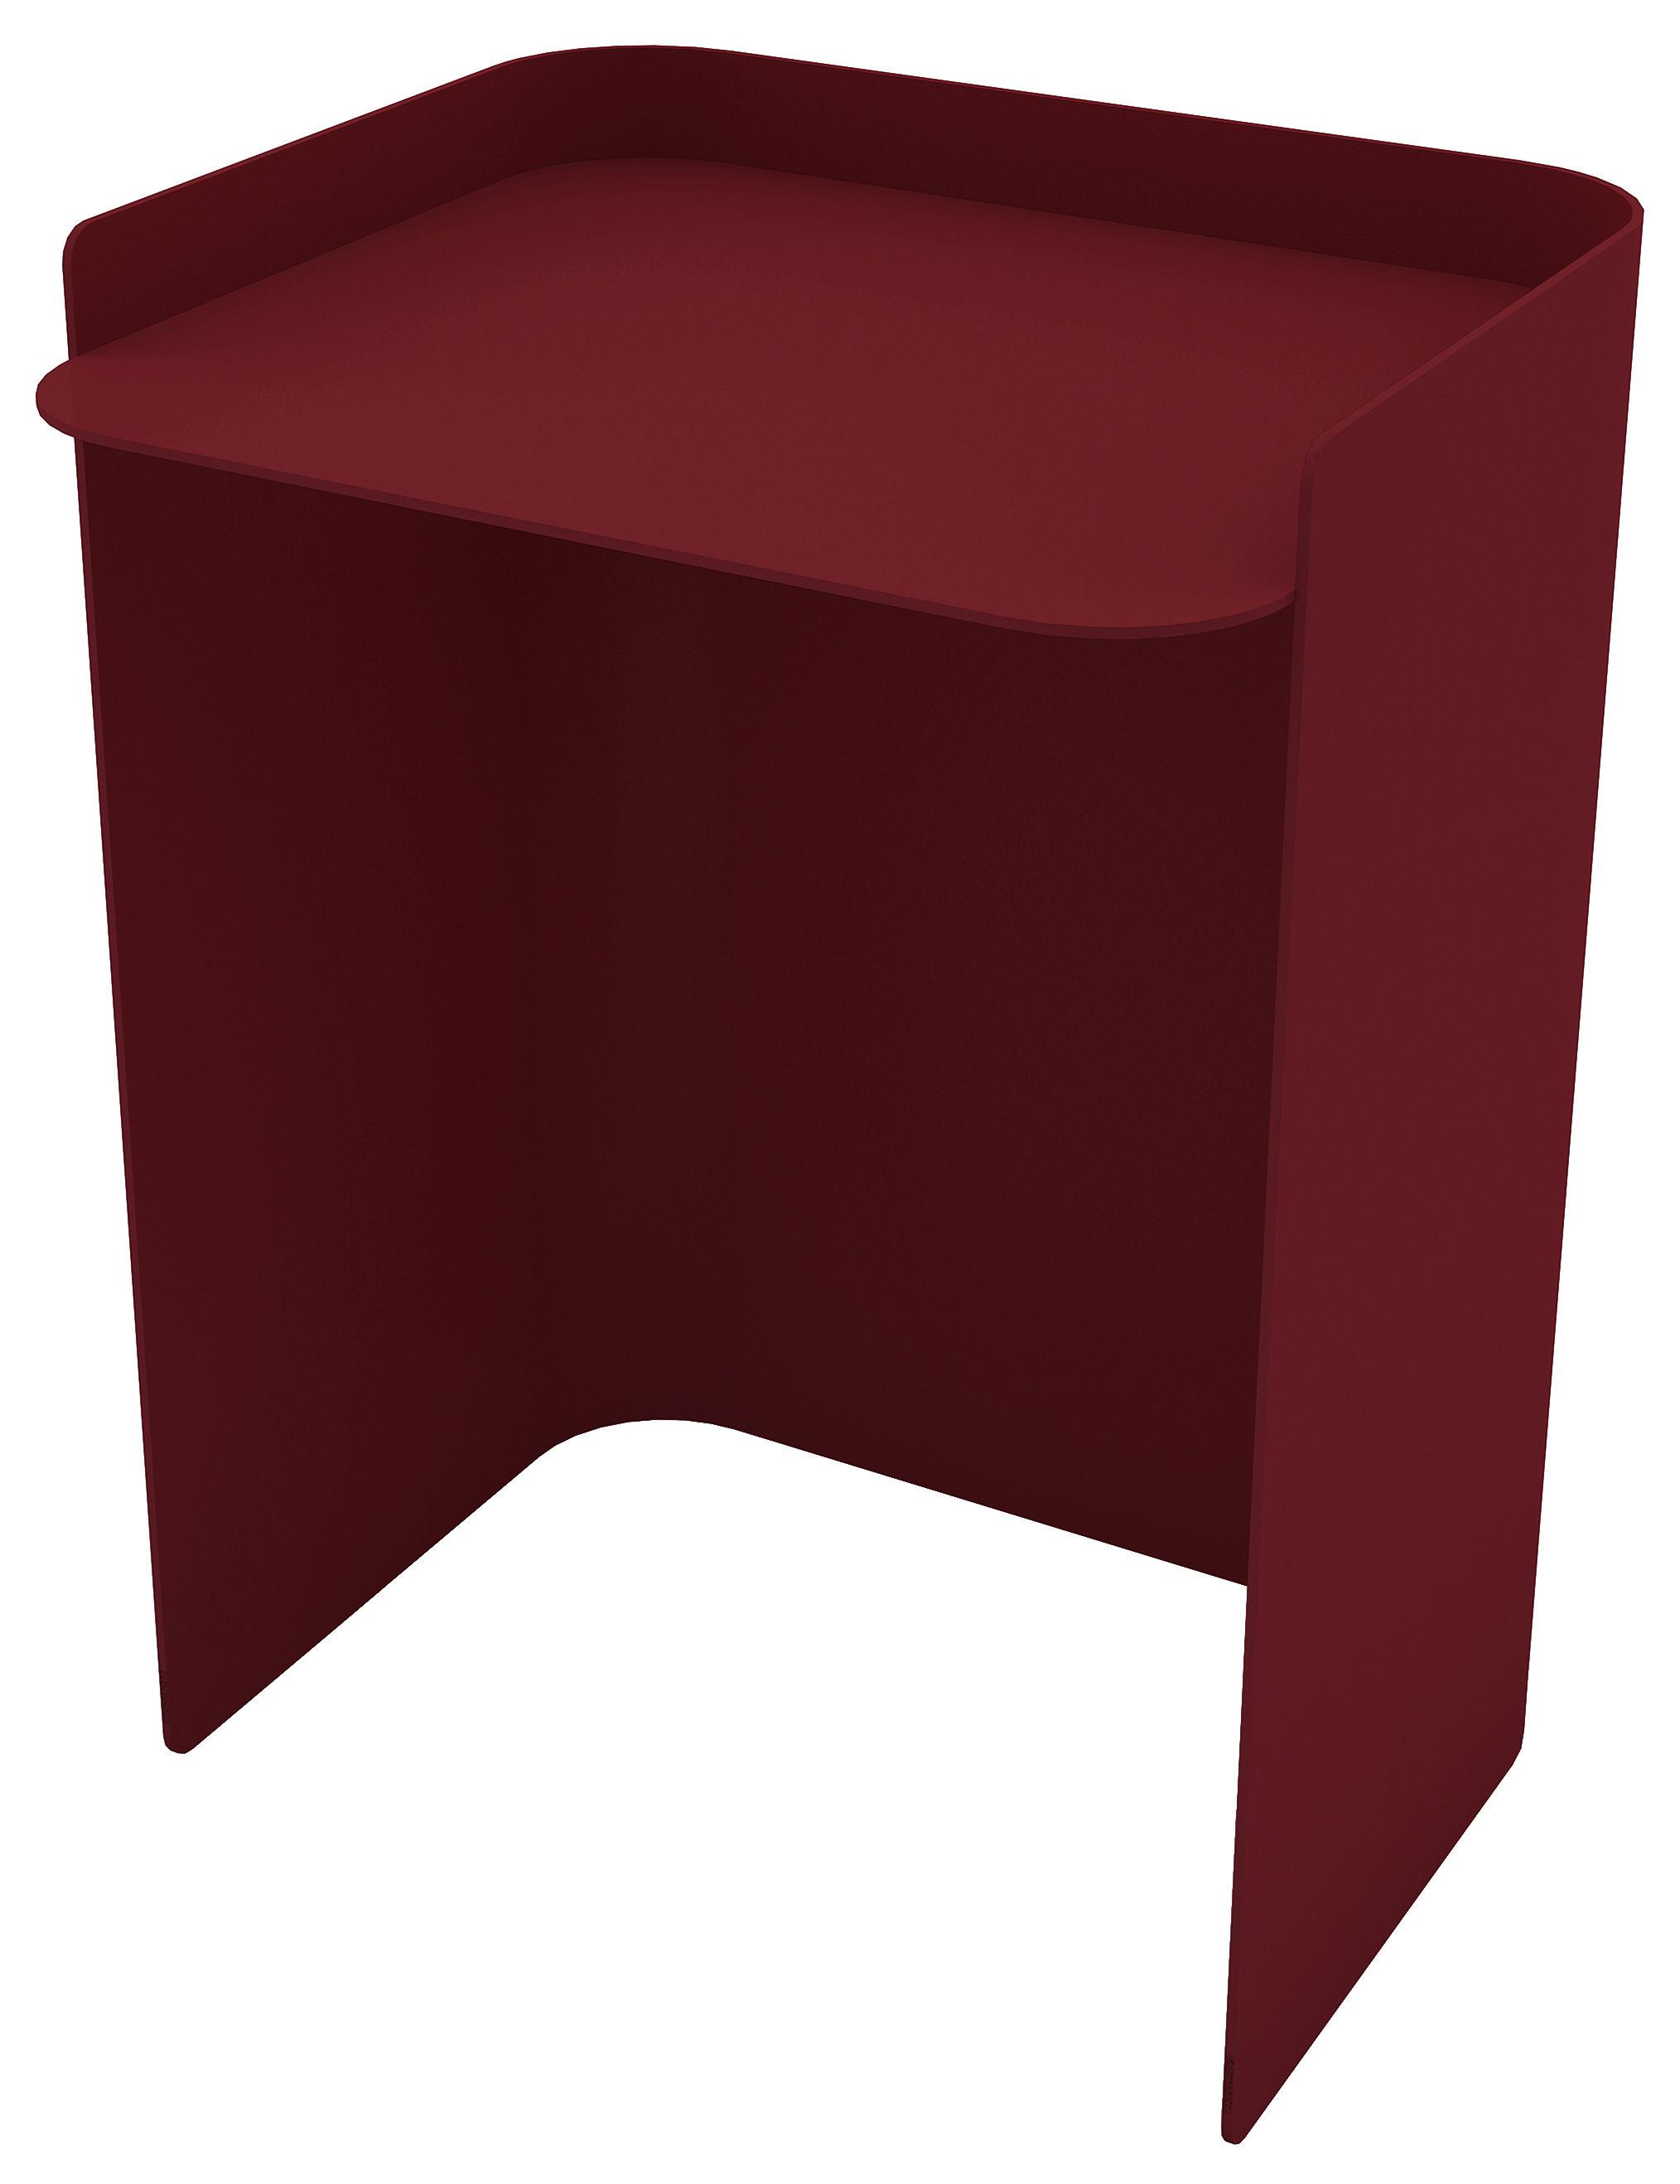 Möbel - Couchtische - Flor Beistelltisch / Large - H 49 cm - Matière Grise - Purpurrot - bemalter Stahl